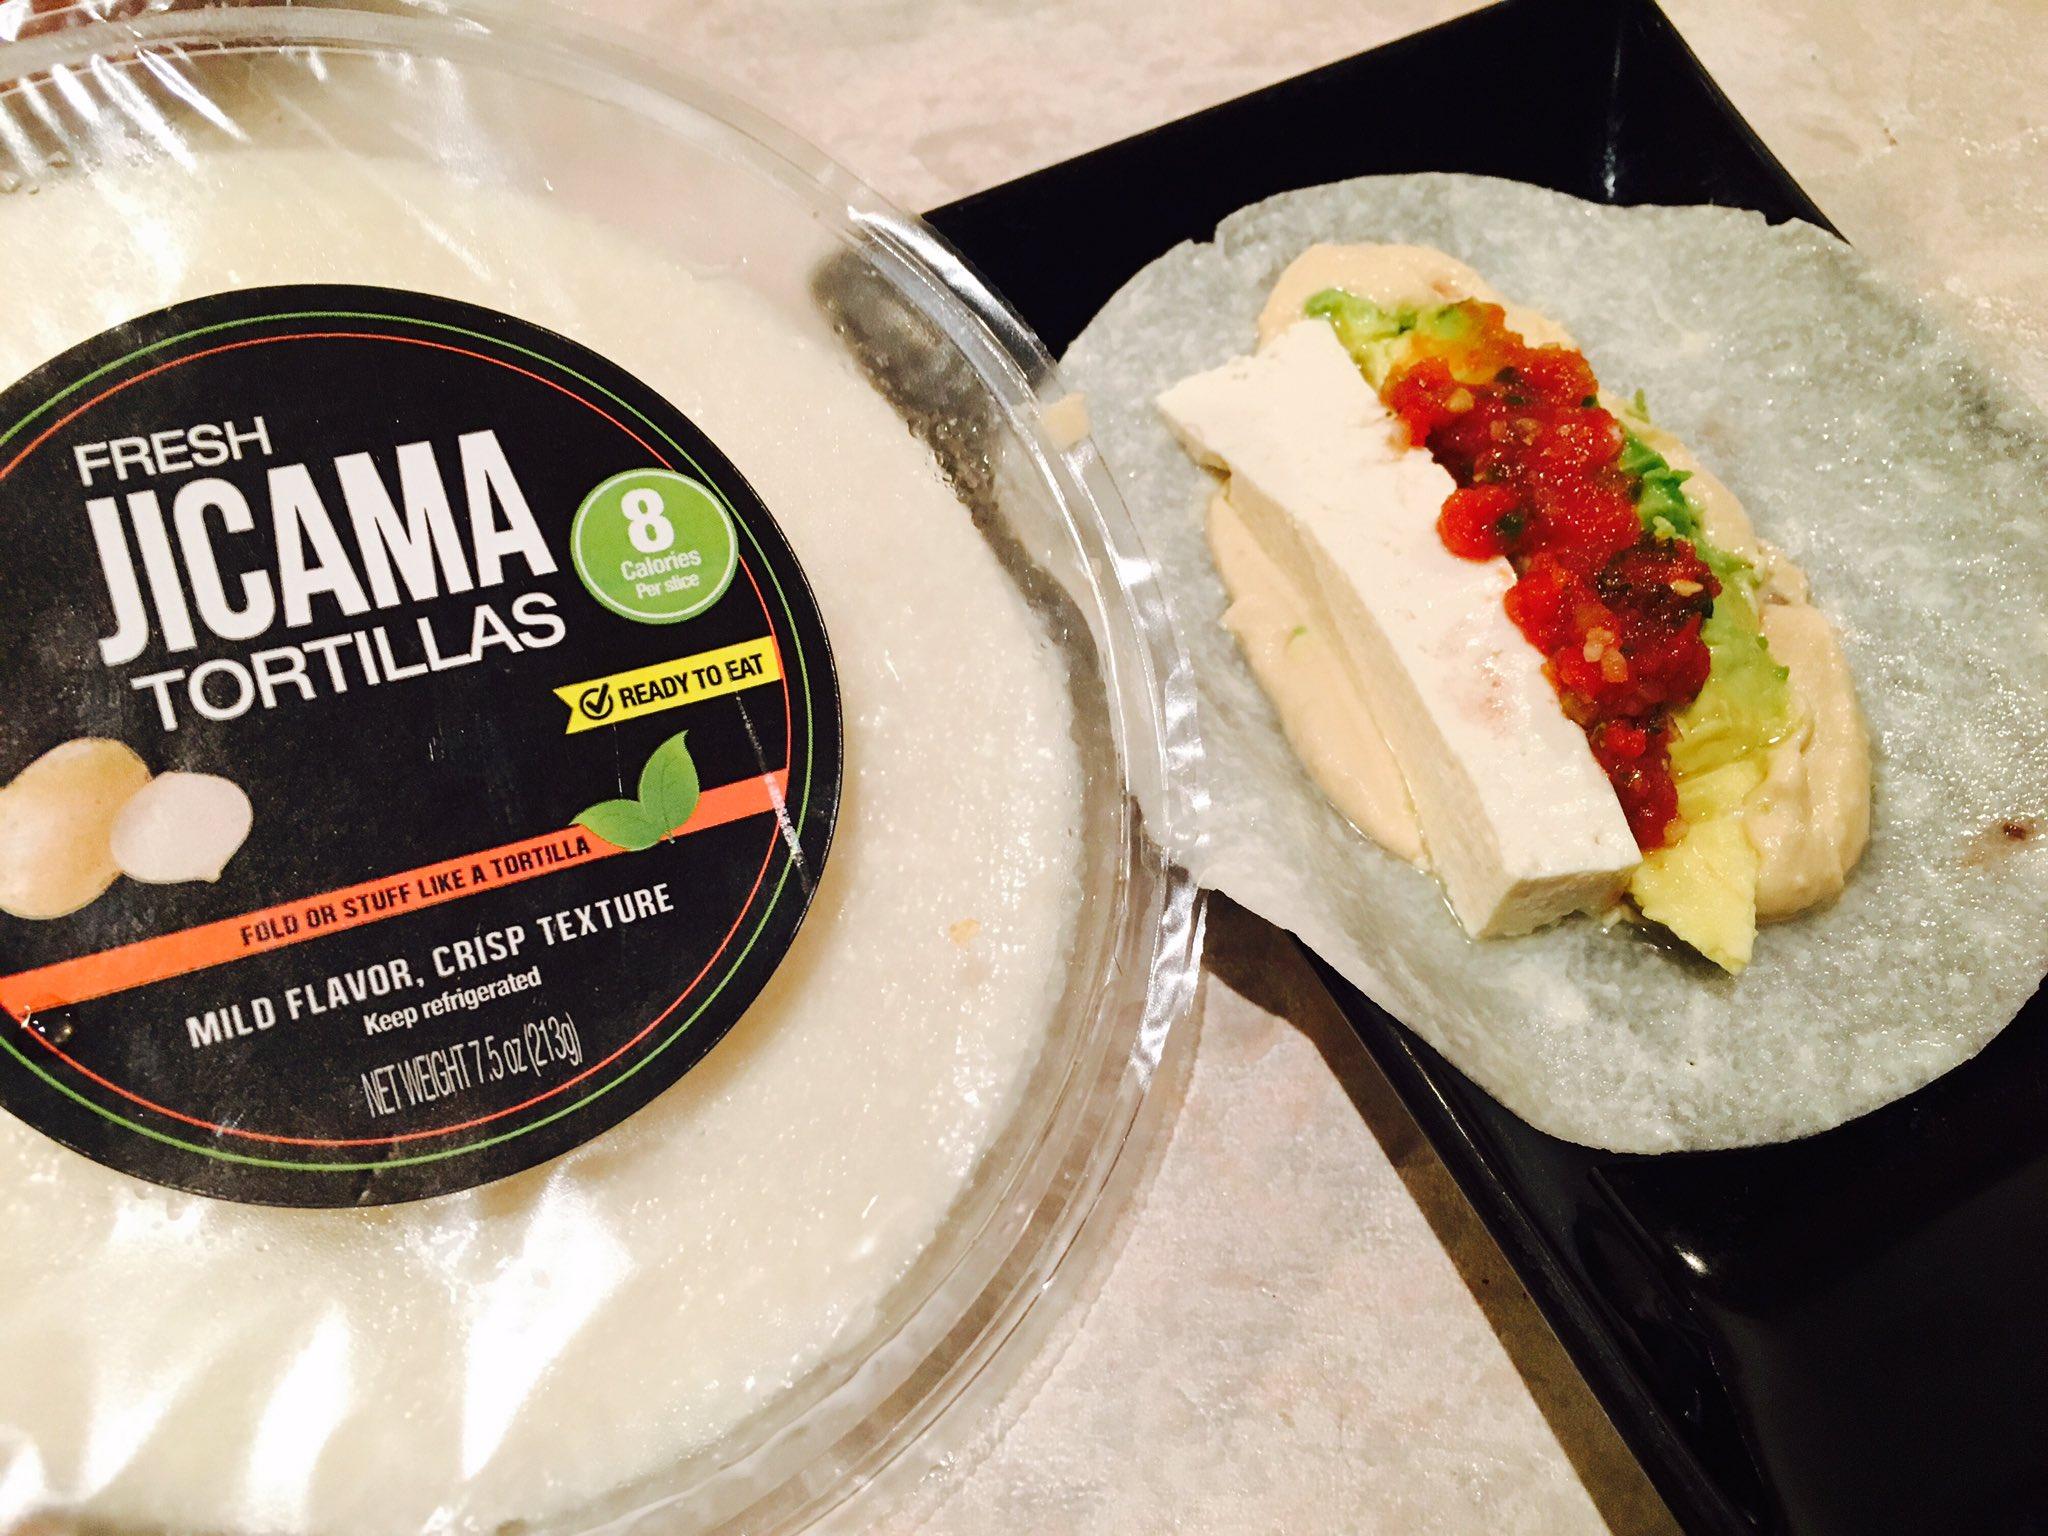 Jicama Tortillas Whole Foods